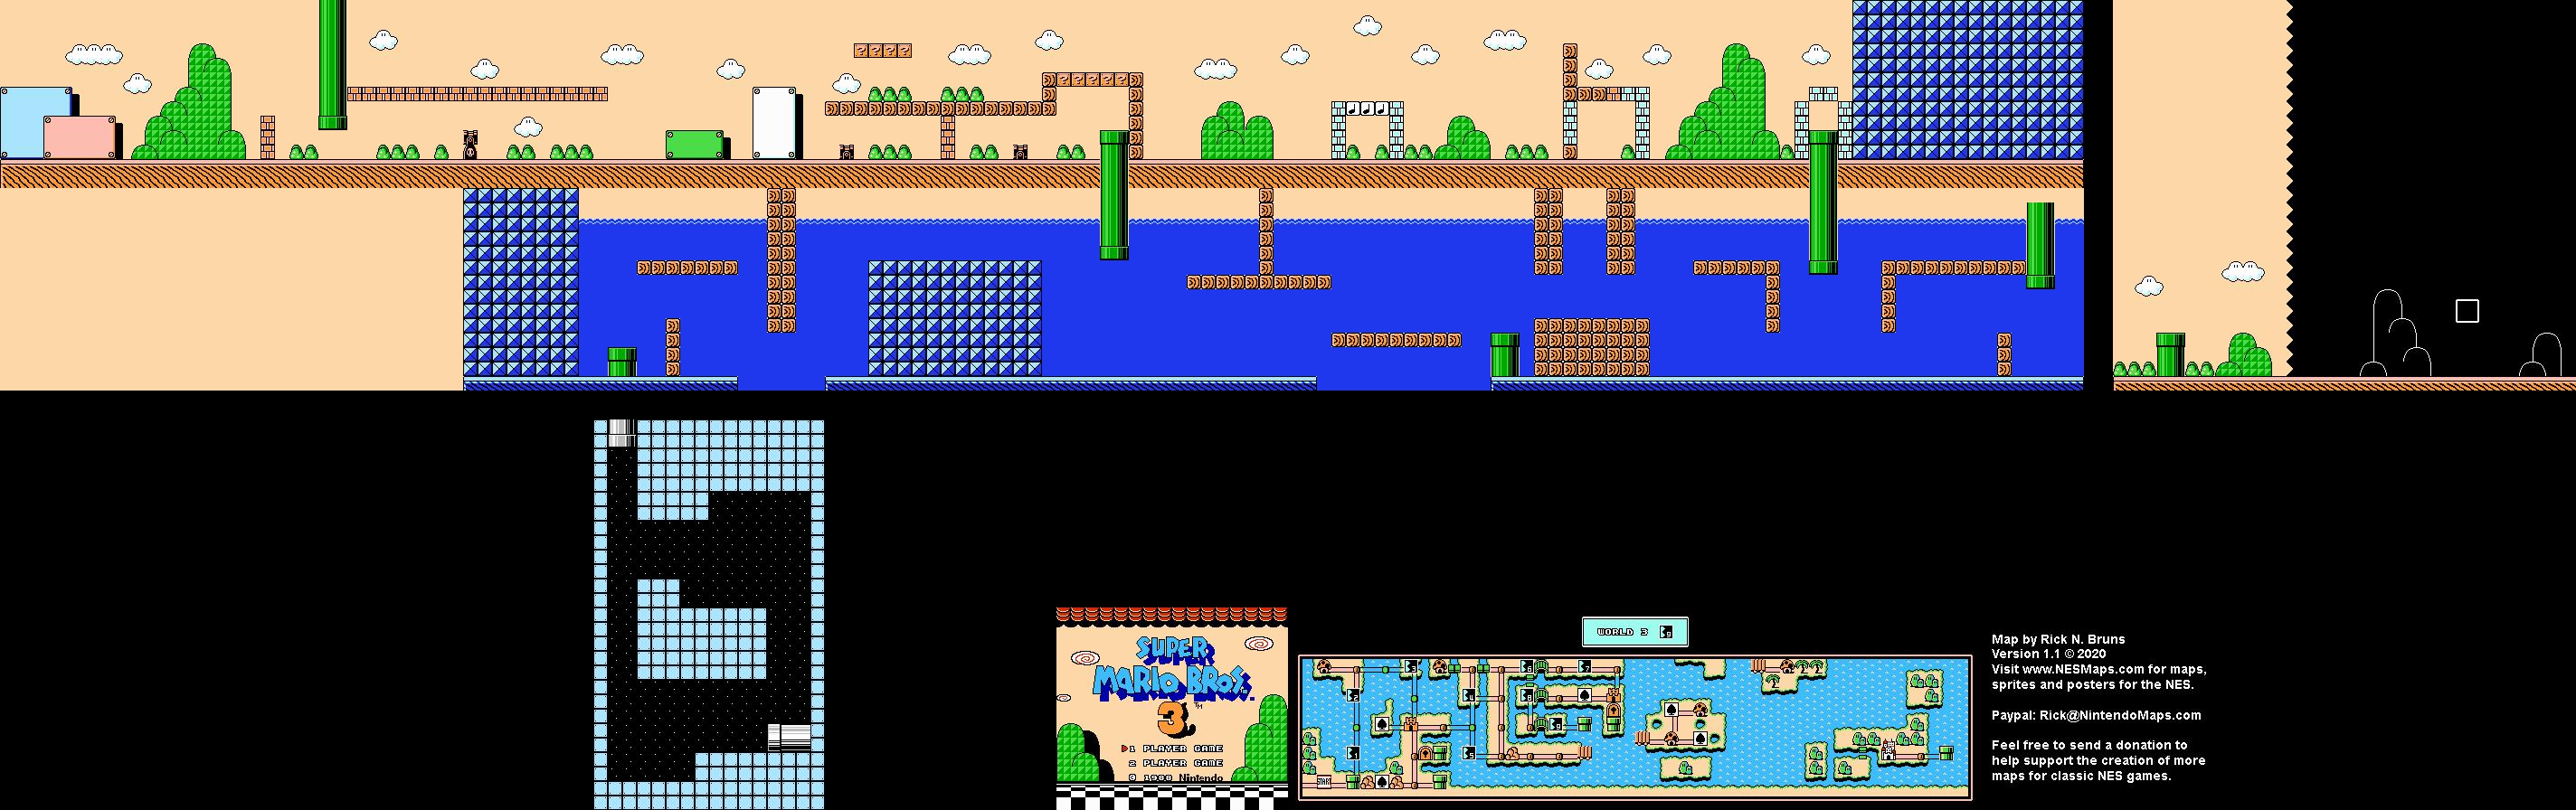 Super Mario Brothers 3 - World 3-9 Nintendo NES Map BG